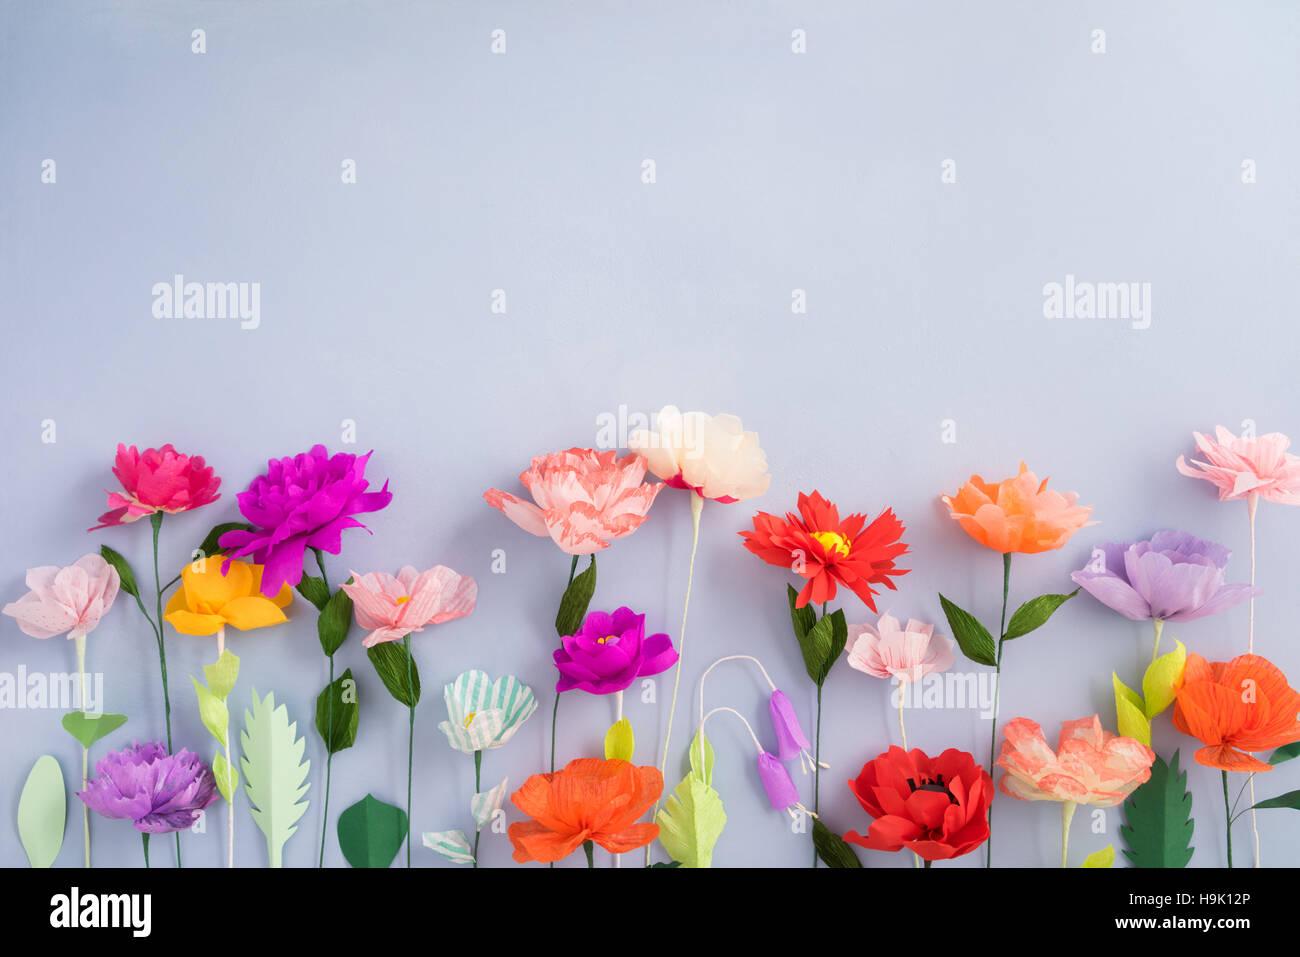 Handmade Paper Flowers Stock Photo 126422430 Alamy